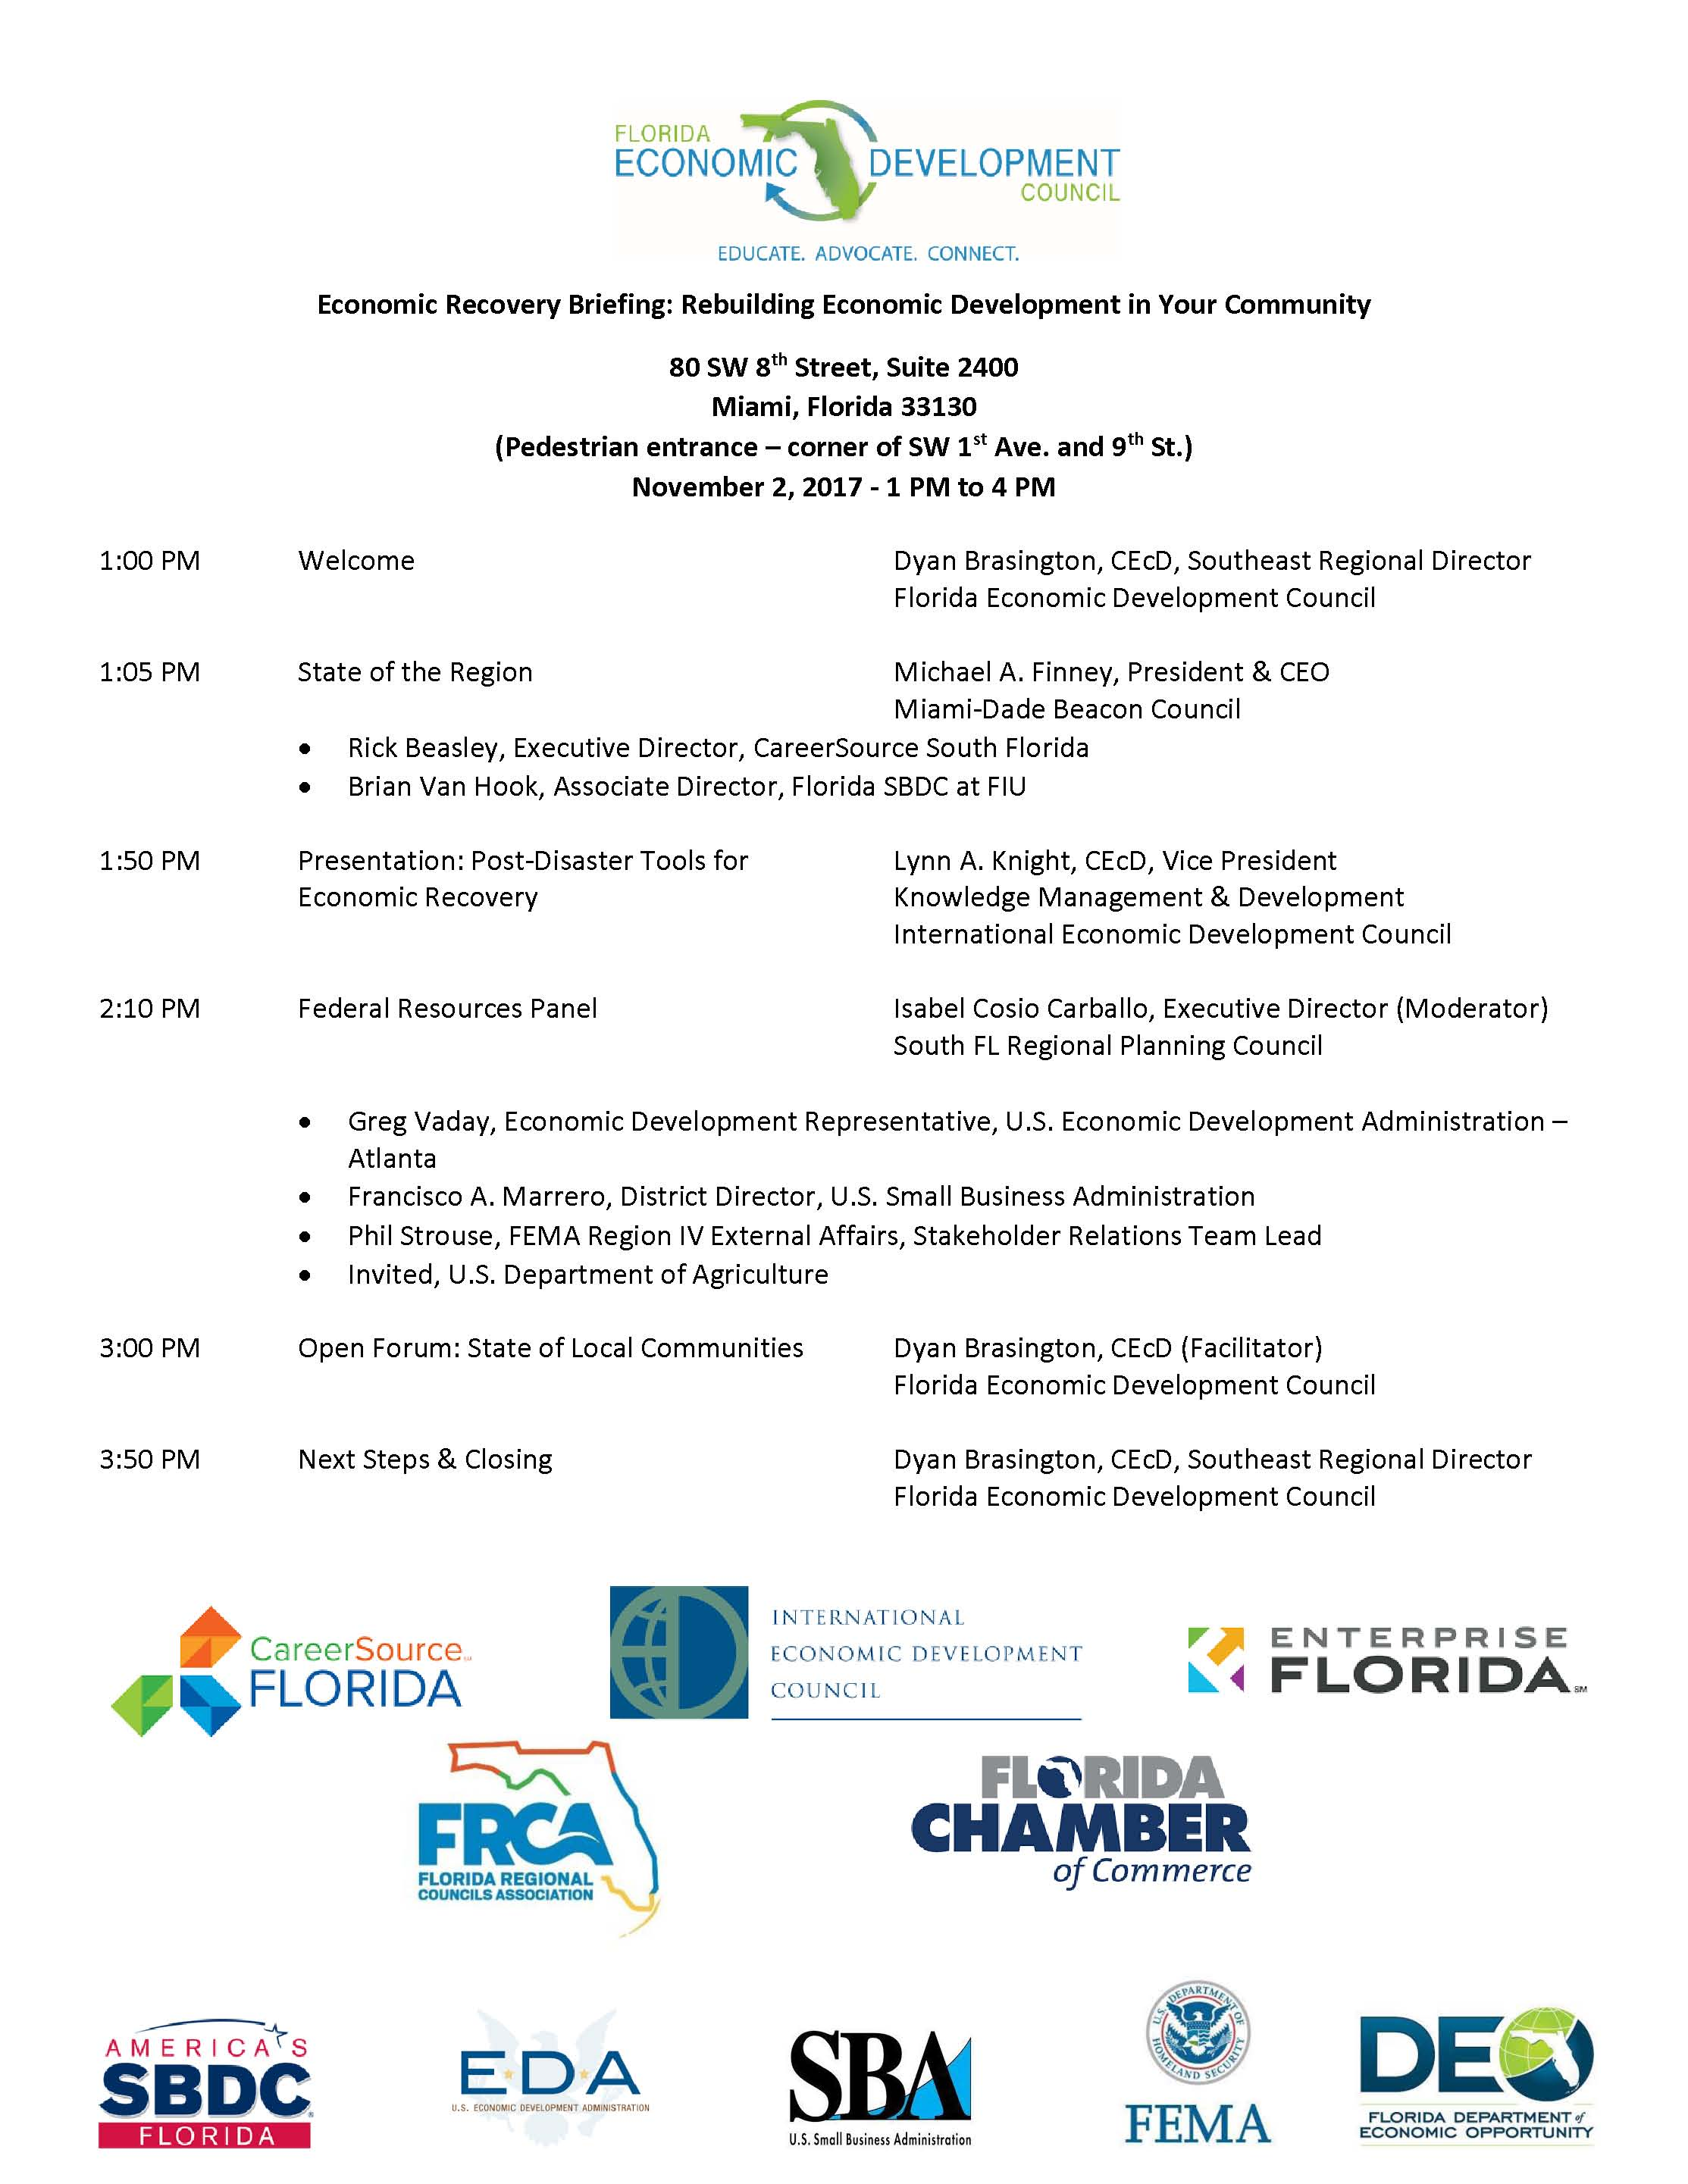 pic for site FEDC Economic Recovery Briefing Agenda_ Nov 2 17 Miami